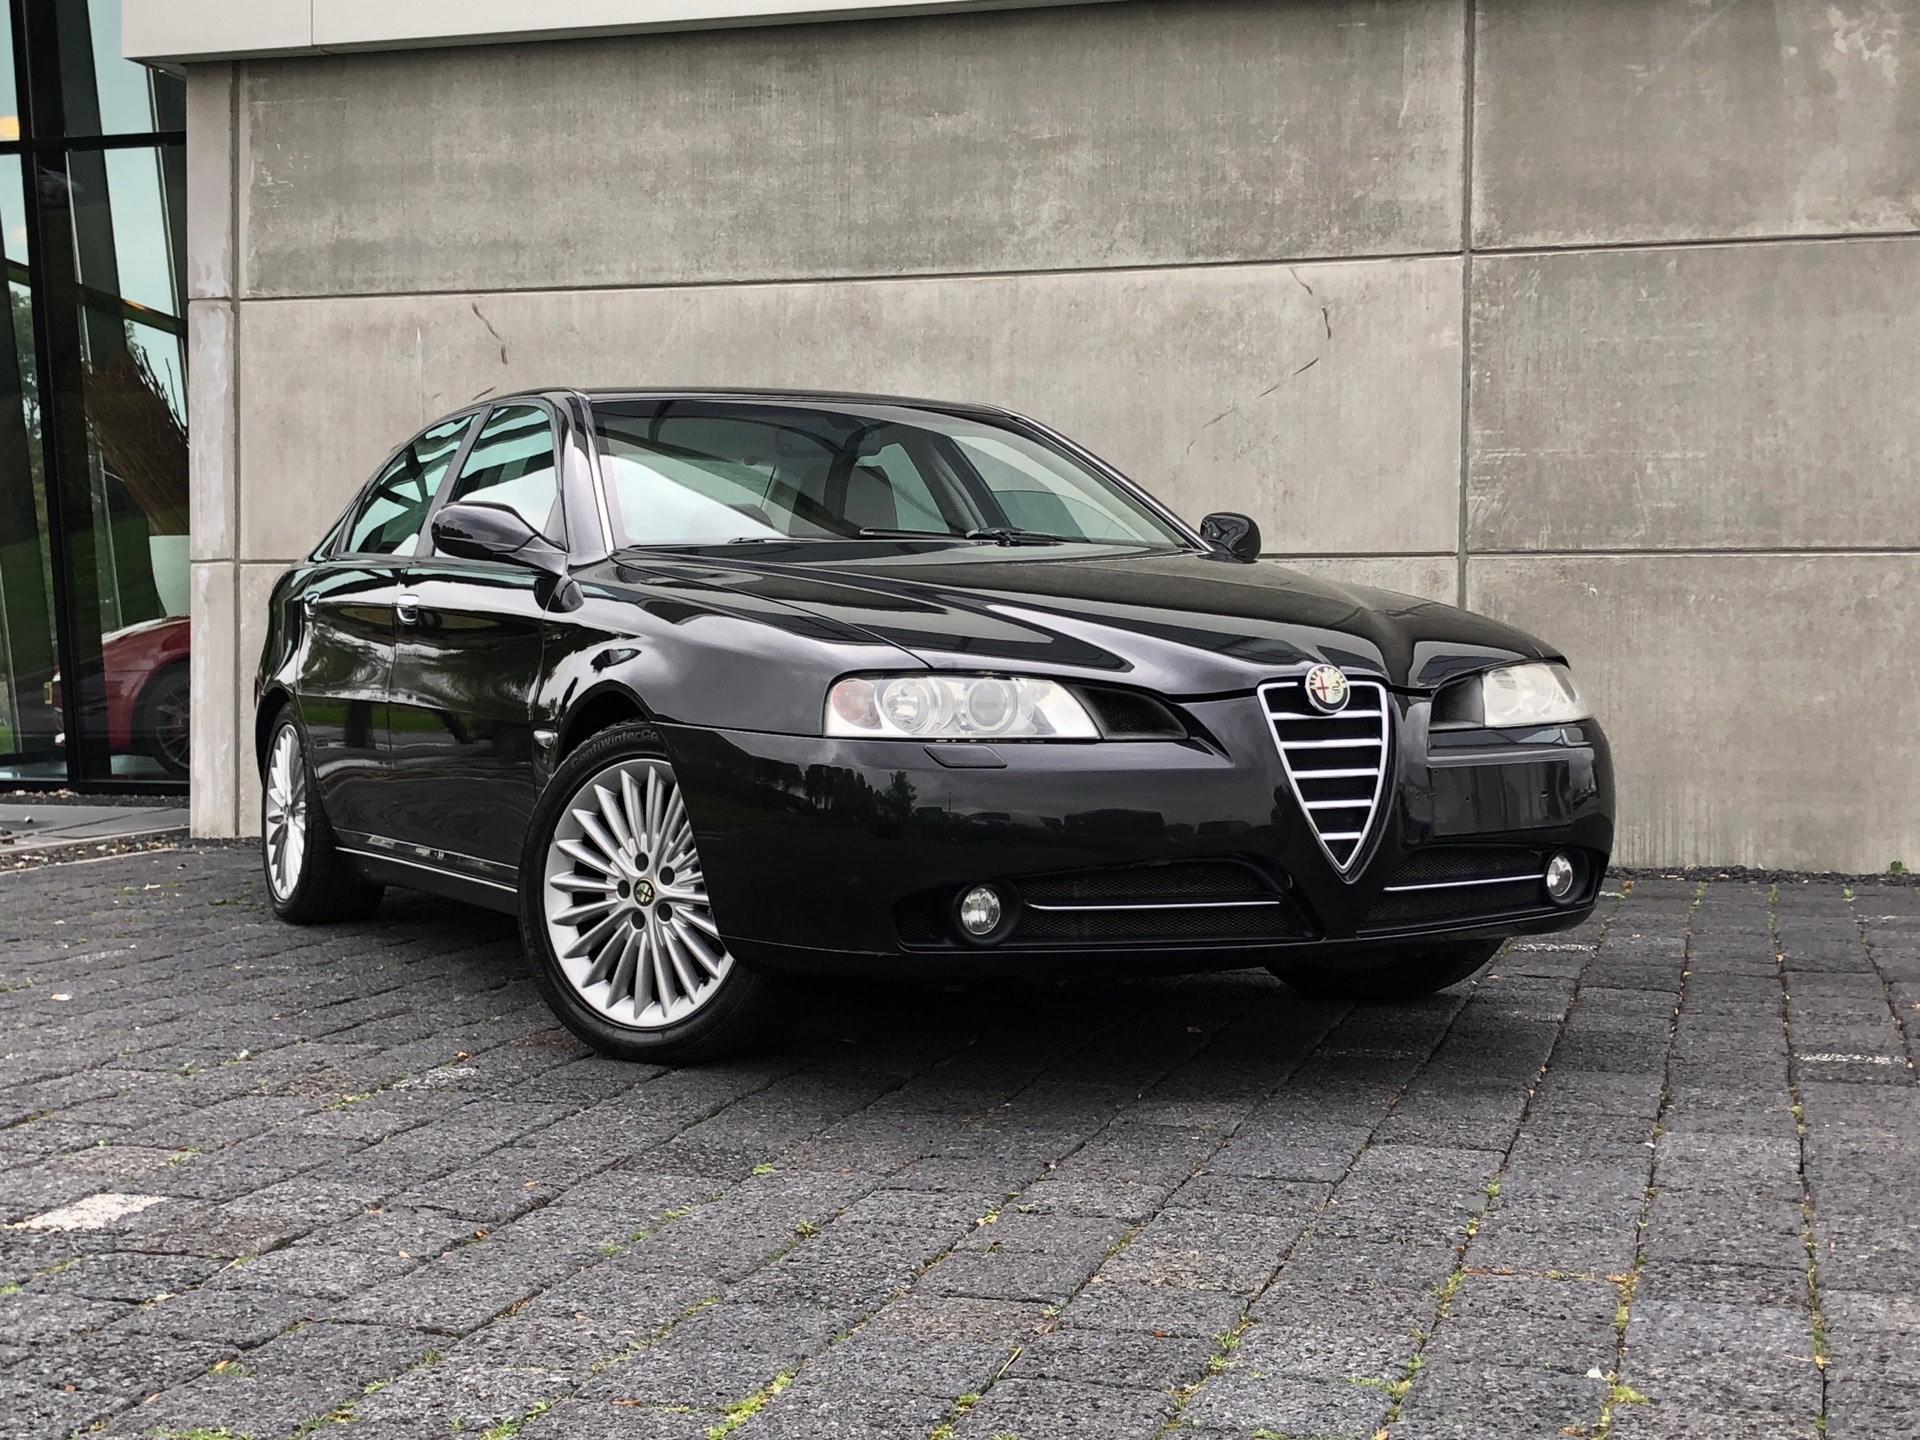 ALFA ROMEO 166 3.2 V6 BUSSO